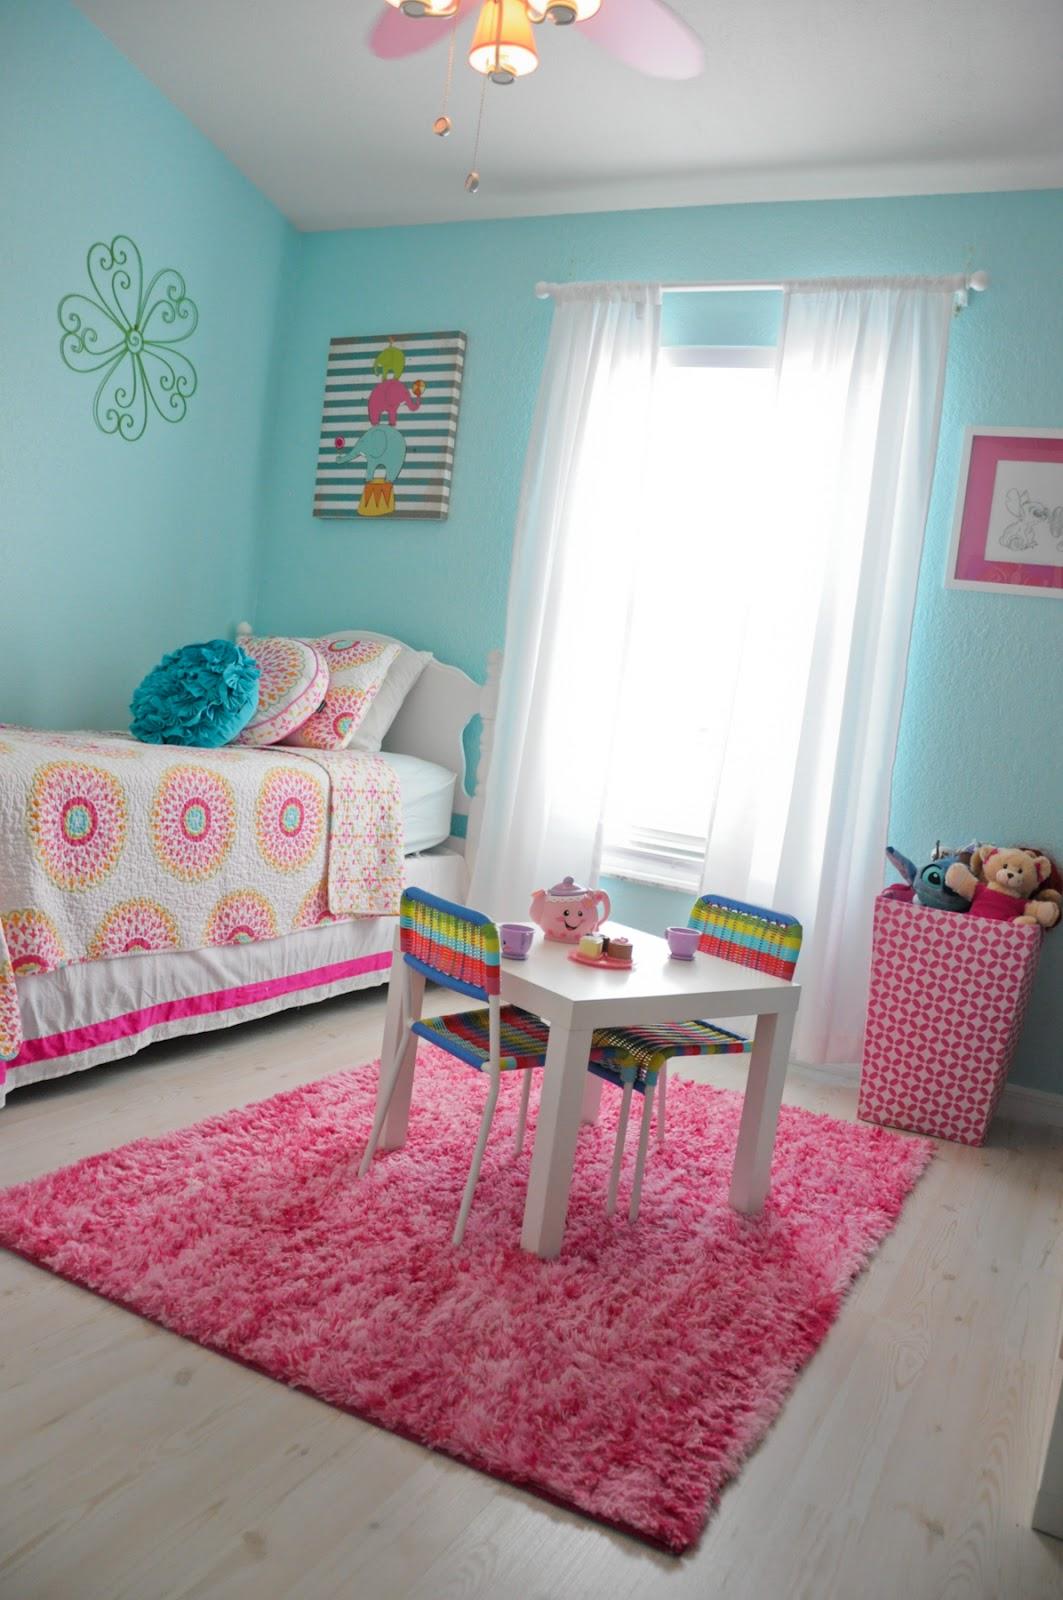 big girl room teal and pink big girl room life baby baby showers parties nurseries. Black Bedroom Furniture Sets. Home Design Ideas